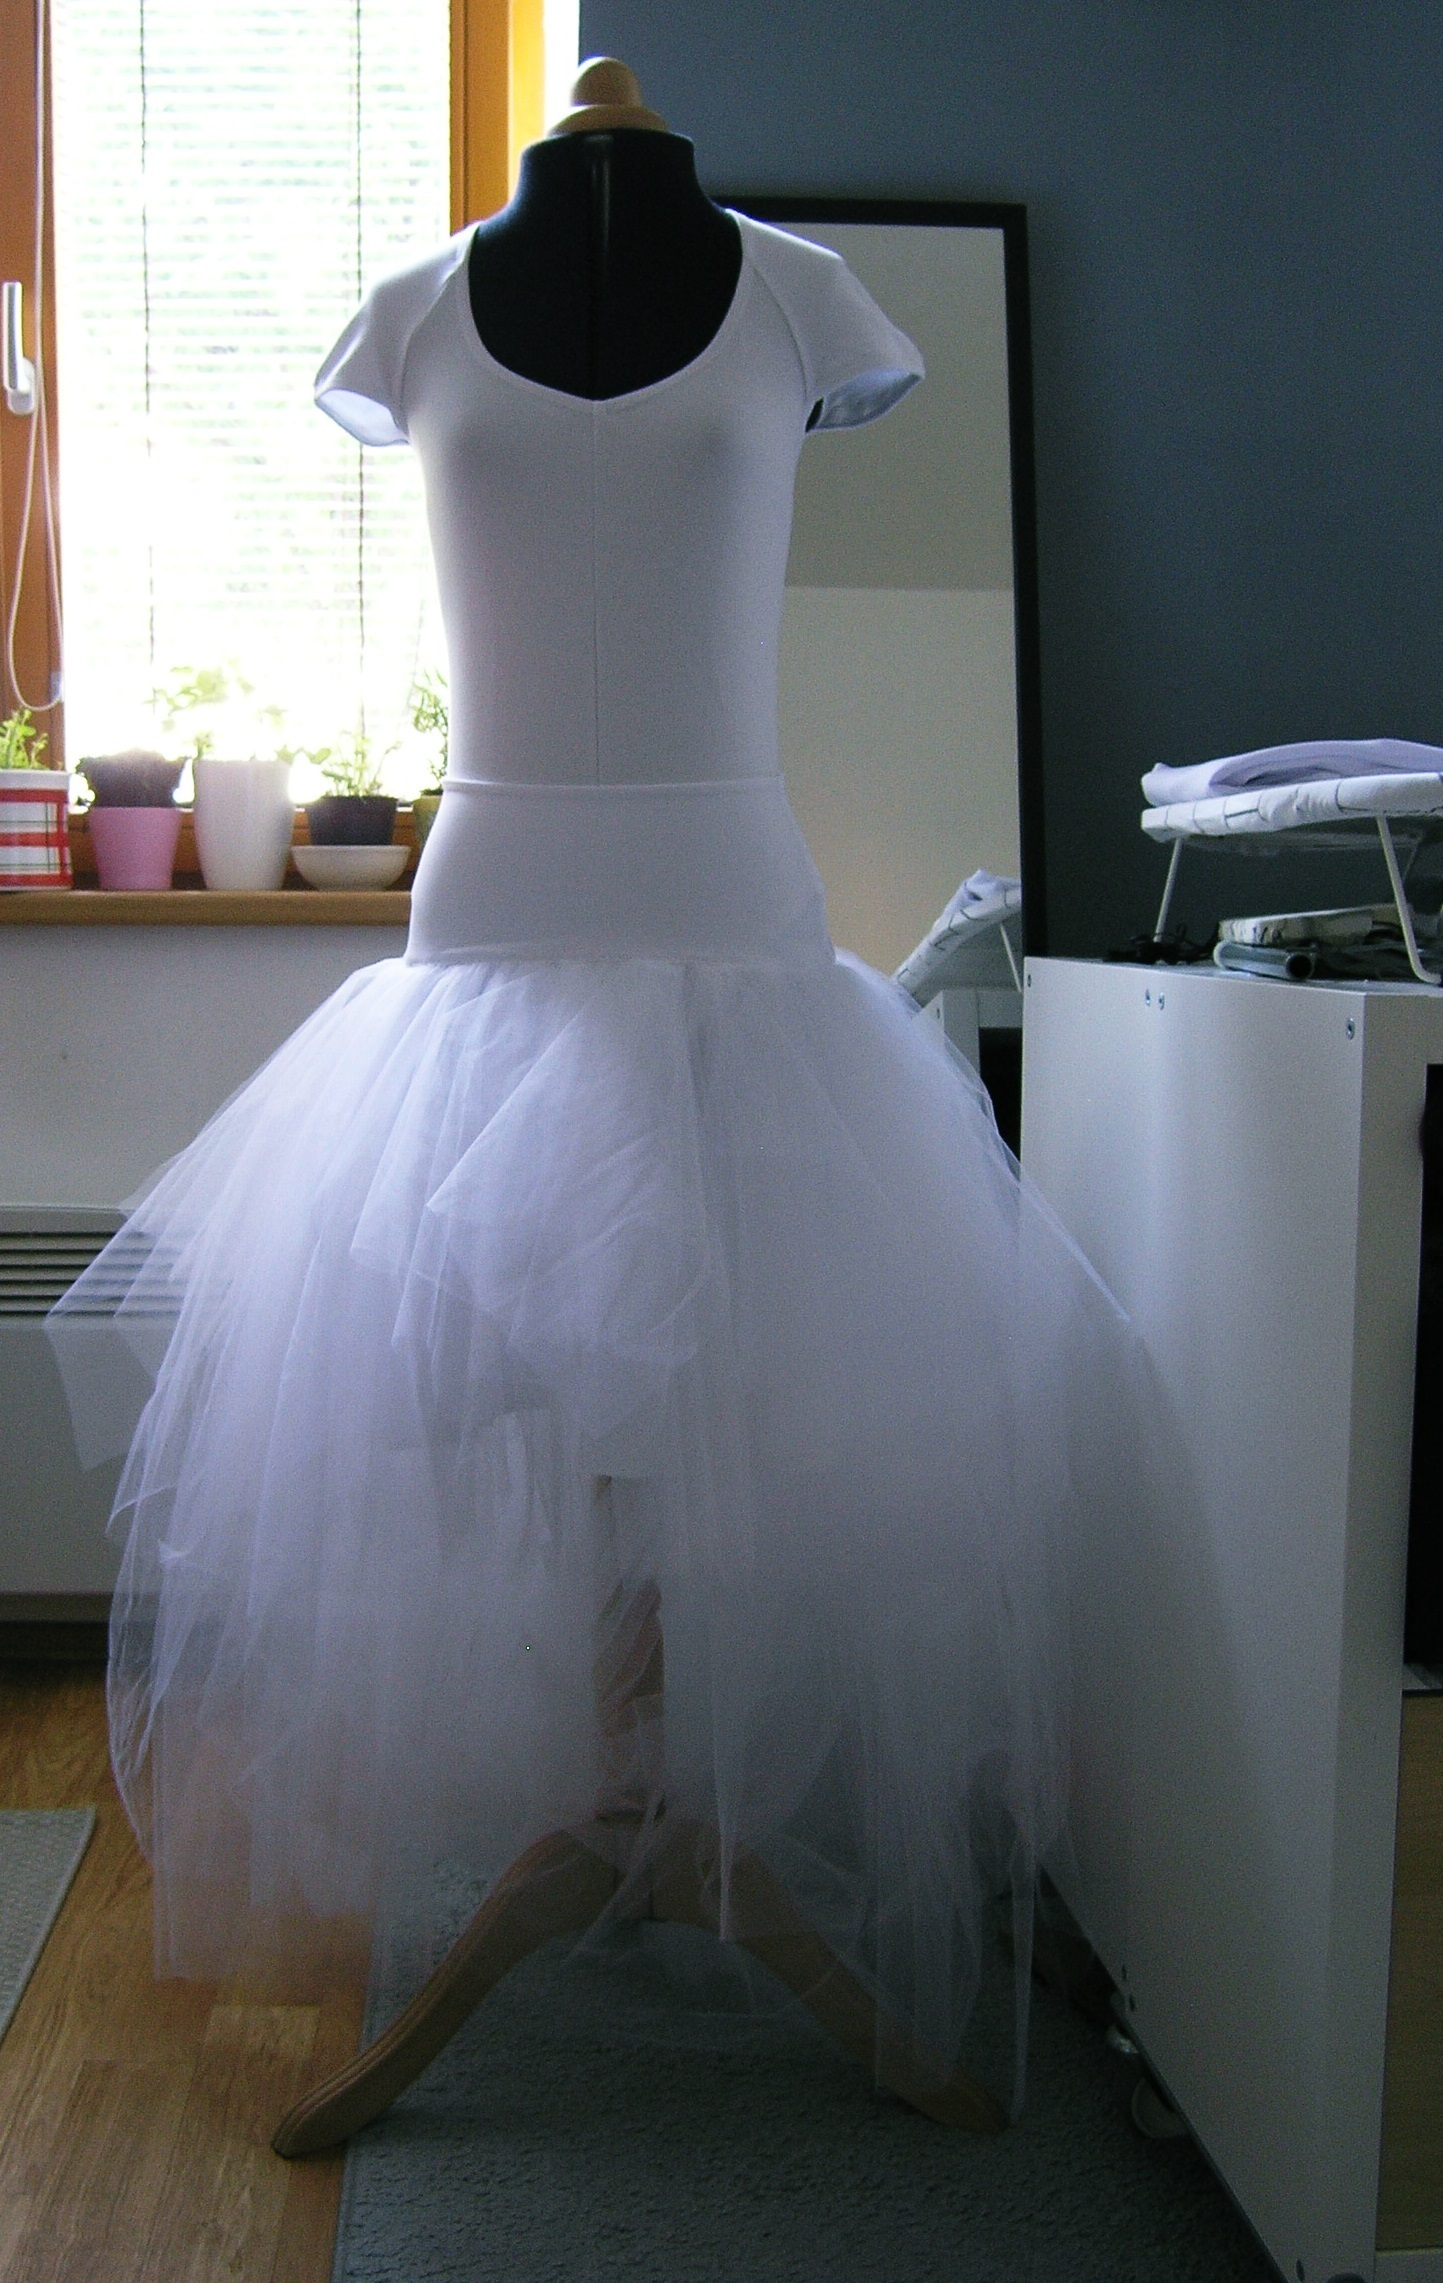 77ac1a6a916 Bílá asymetrická sukně + body krátký rukáv   Zboží prodejce ceasara ...